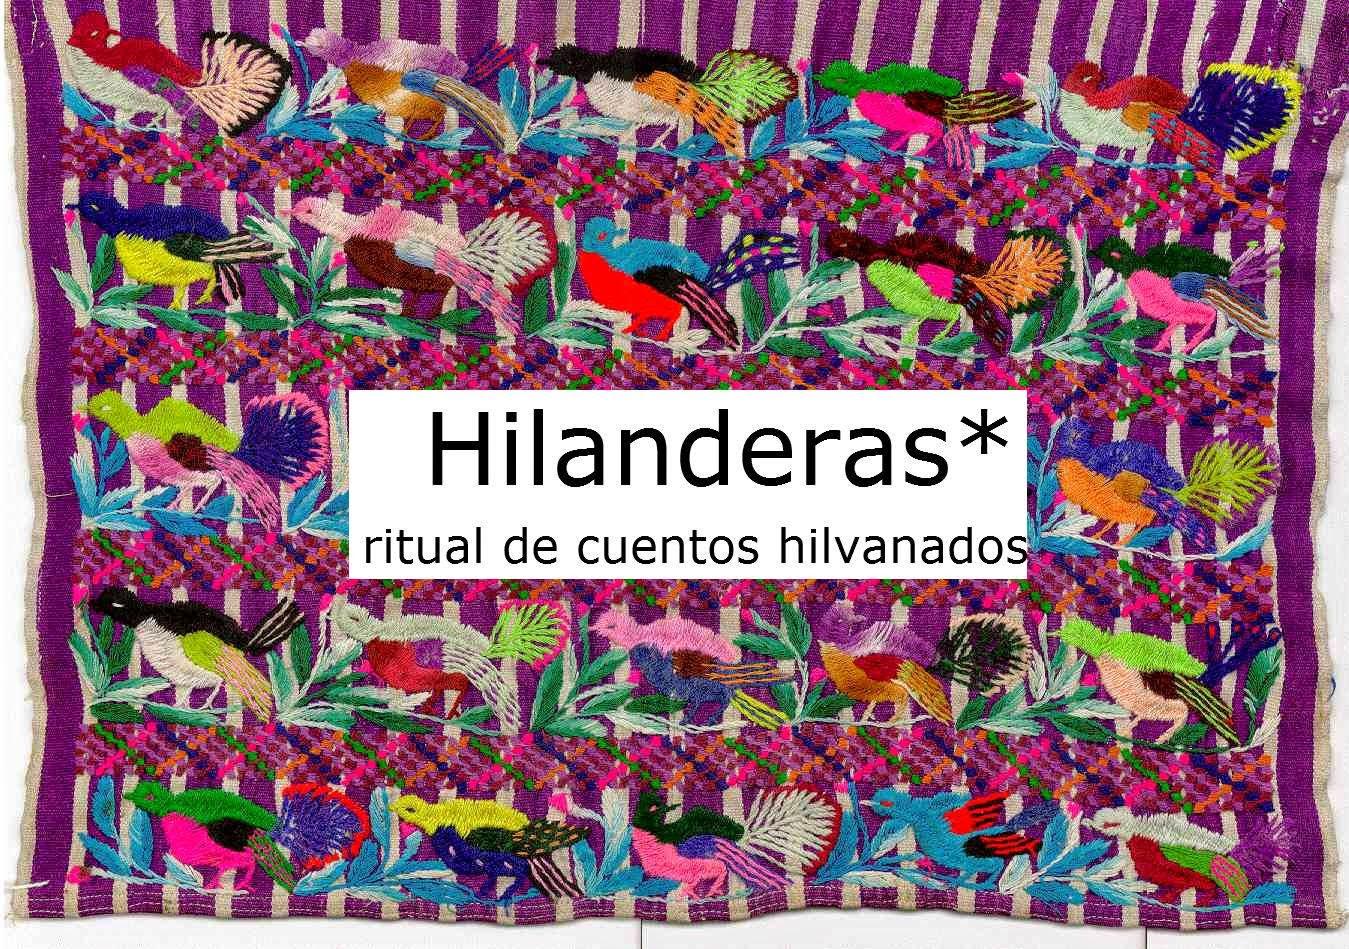 https://www.facebook.com/pages/Hilanderas/118255528273611?fref=ts